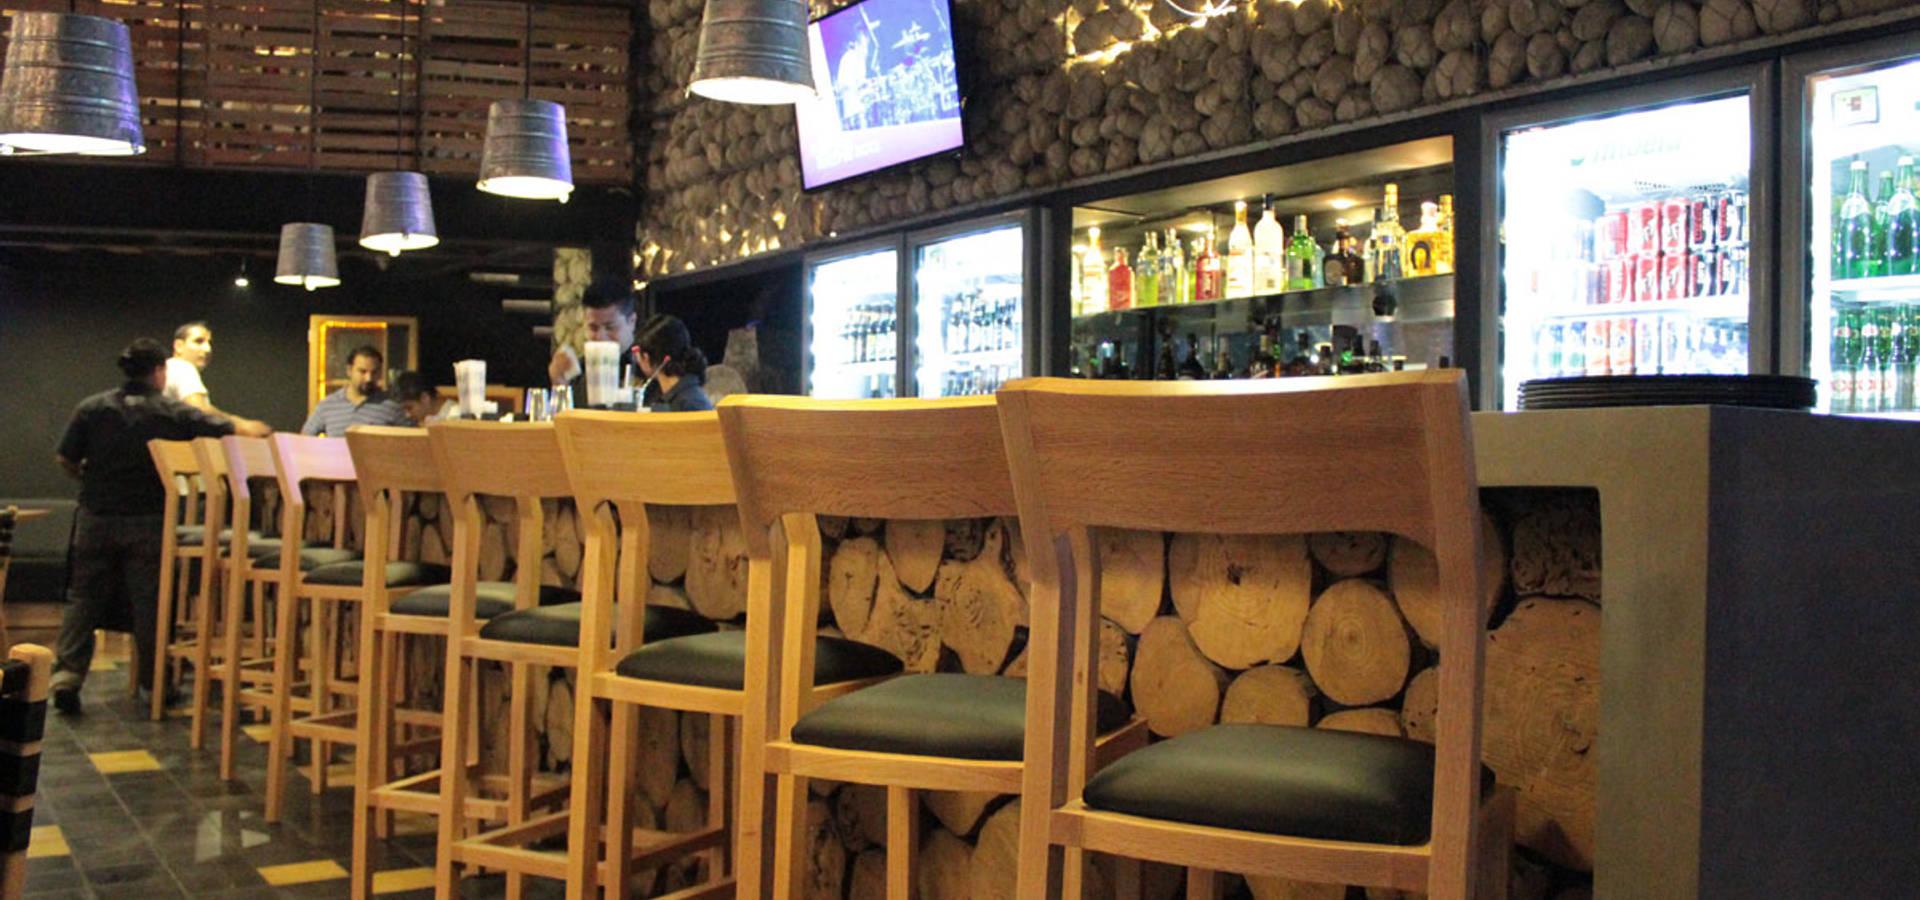 Dise o de bares y restaurantes b arquitectura Arquitectura decoracion de interiores